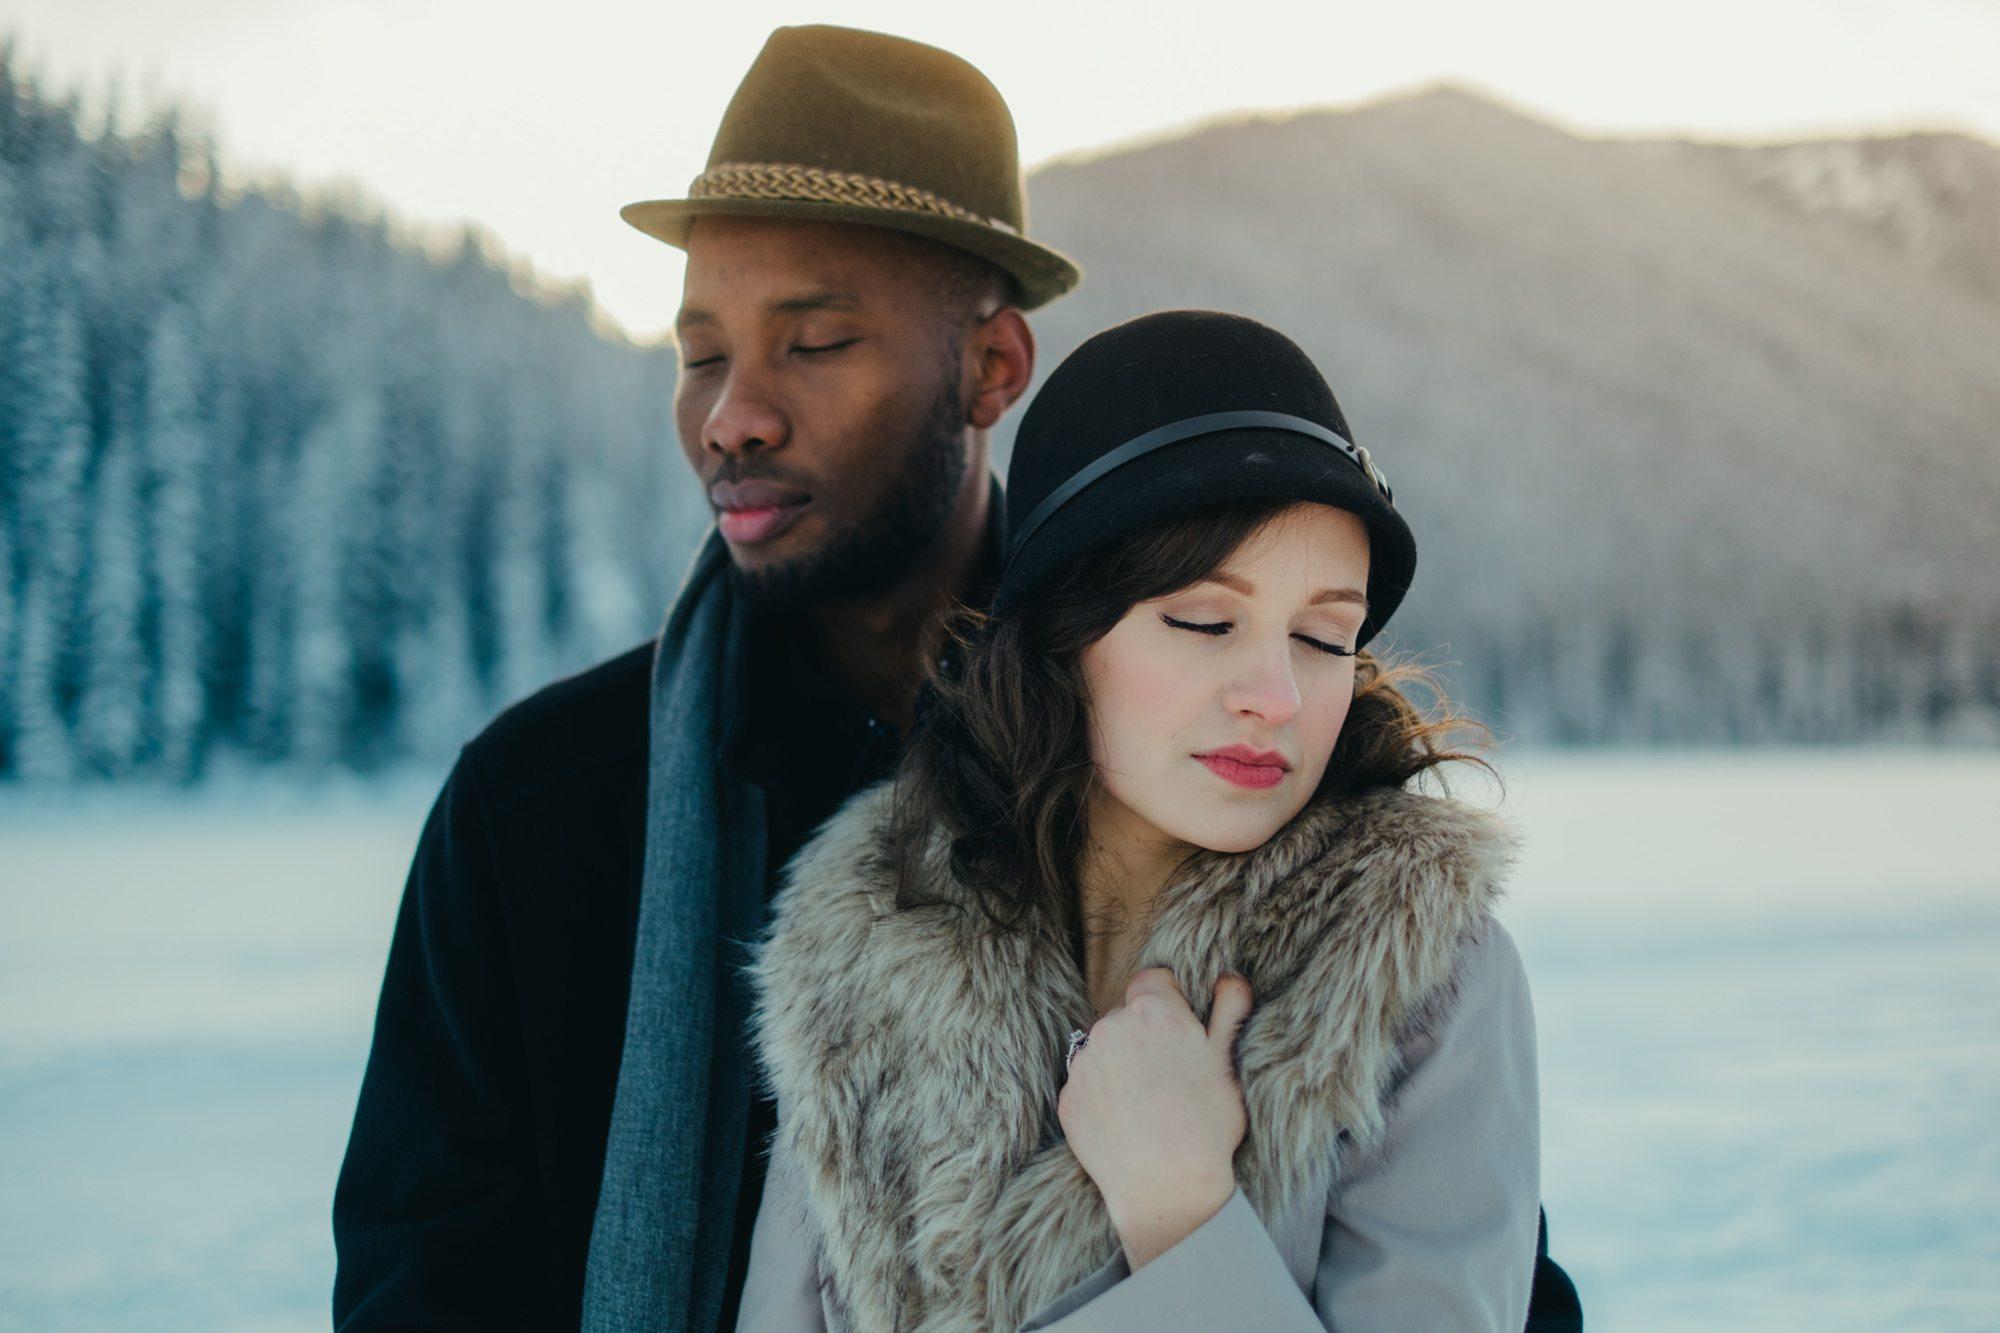 077-adventure-engagement-photographer